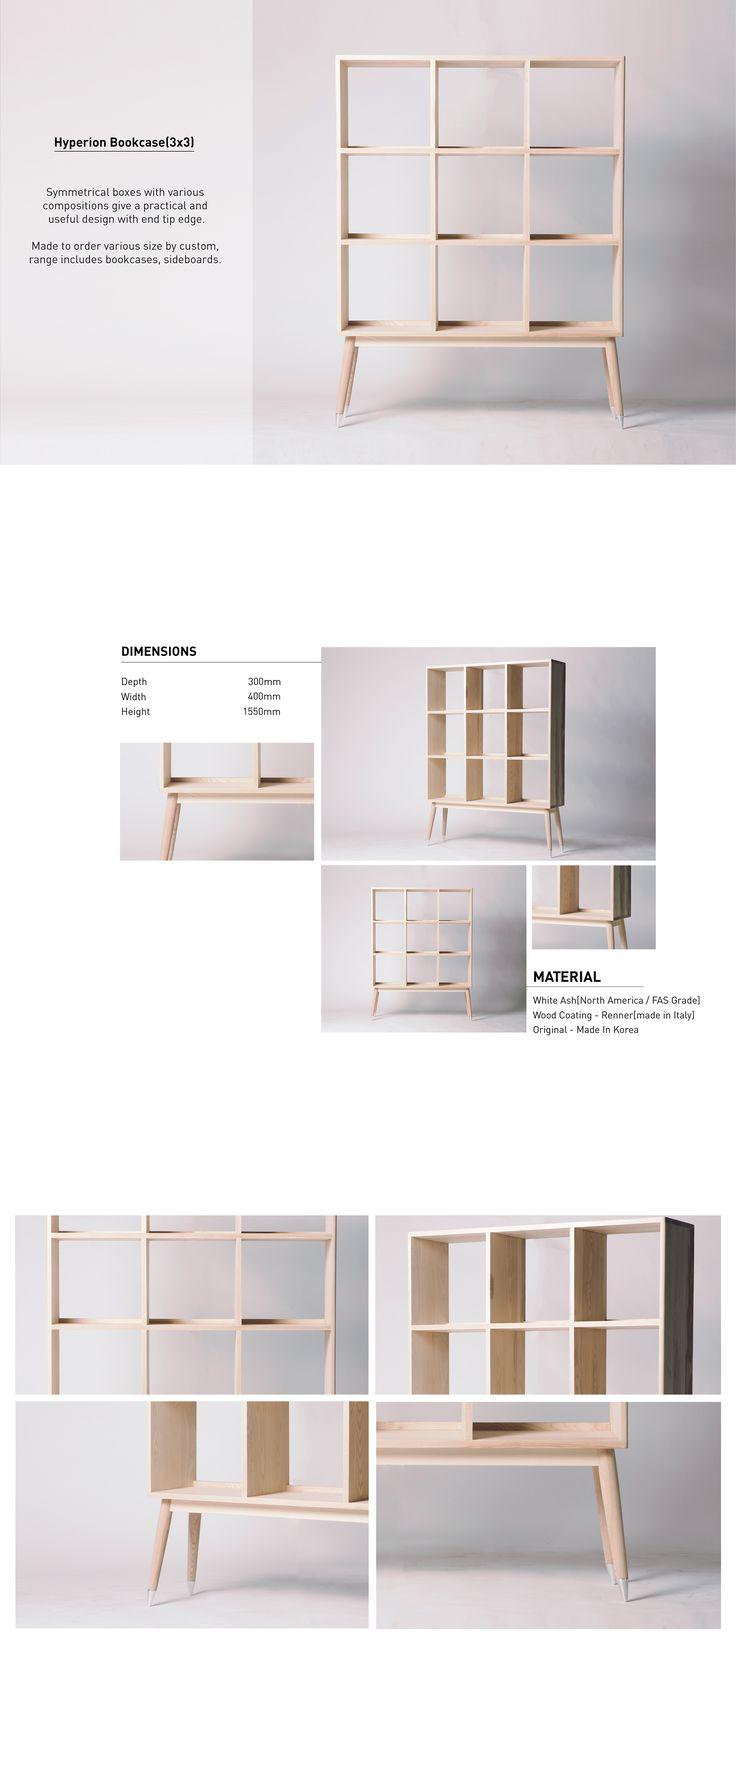 [Ash] Hyperion 3X3 Bookcase